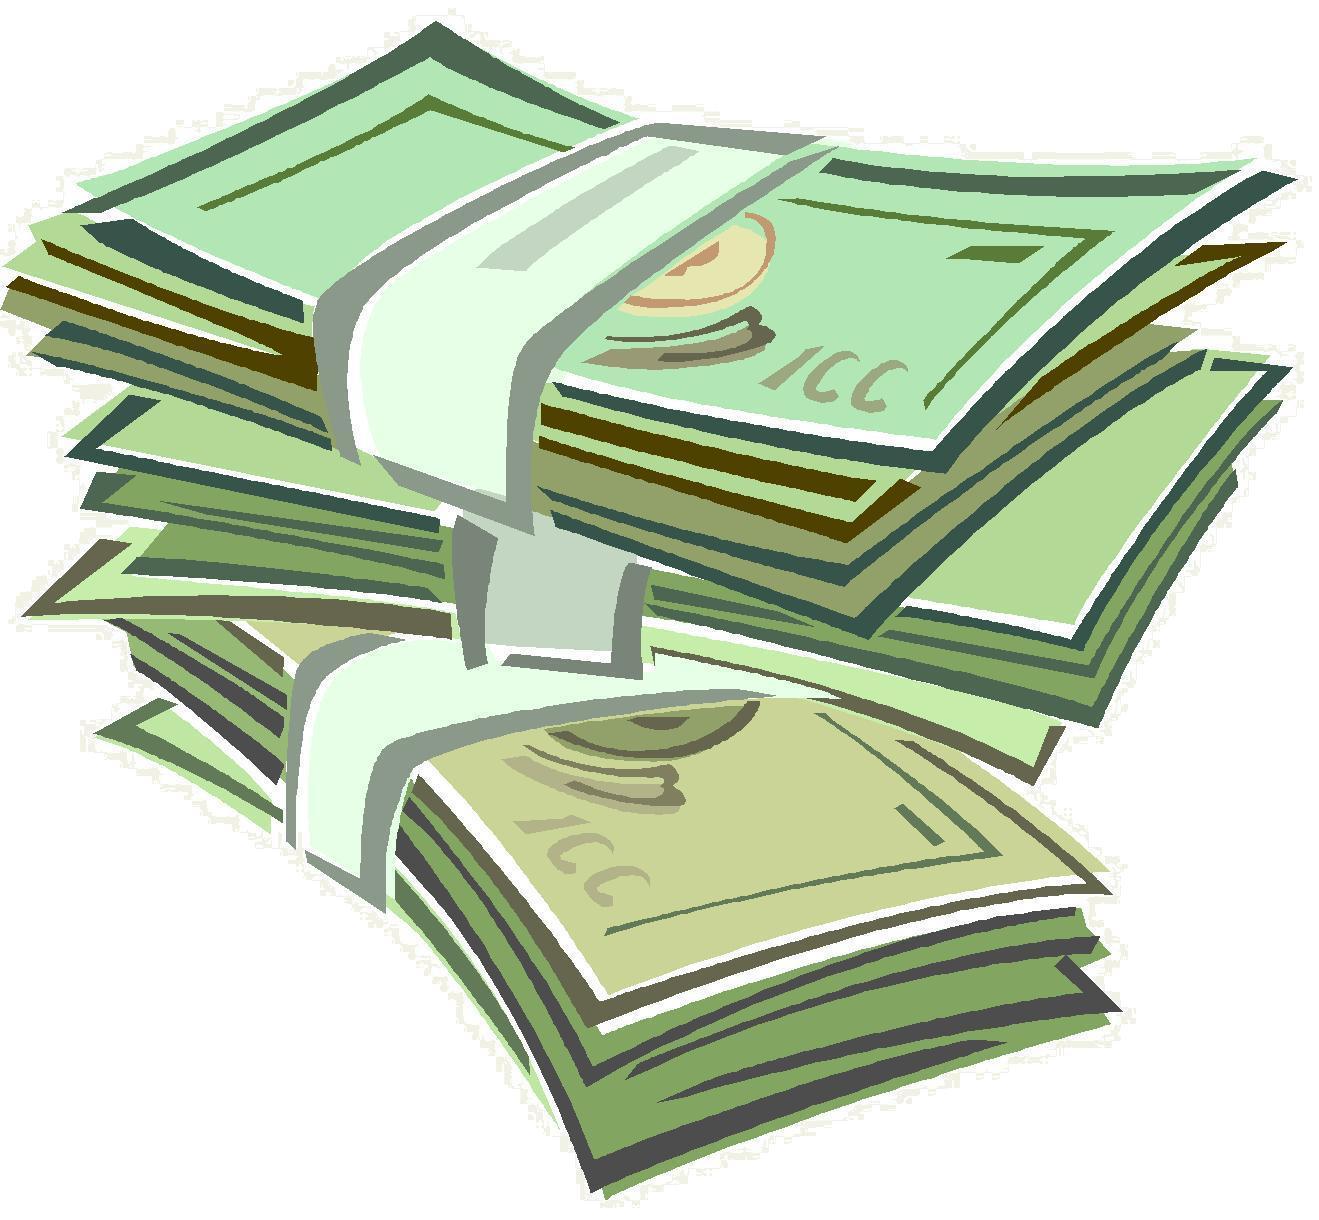 Cash clipart clip art. Money stack panda free